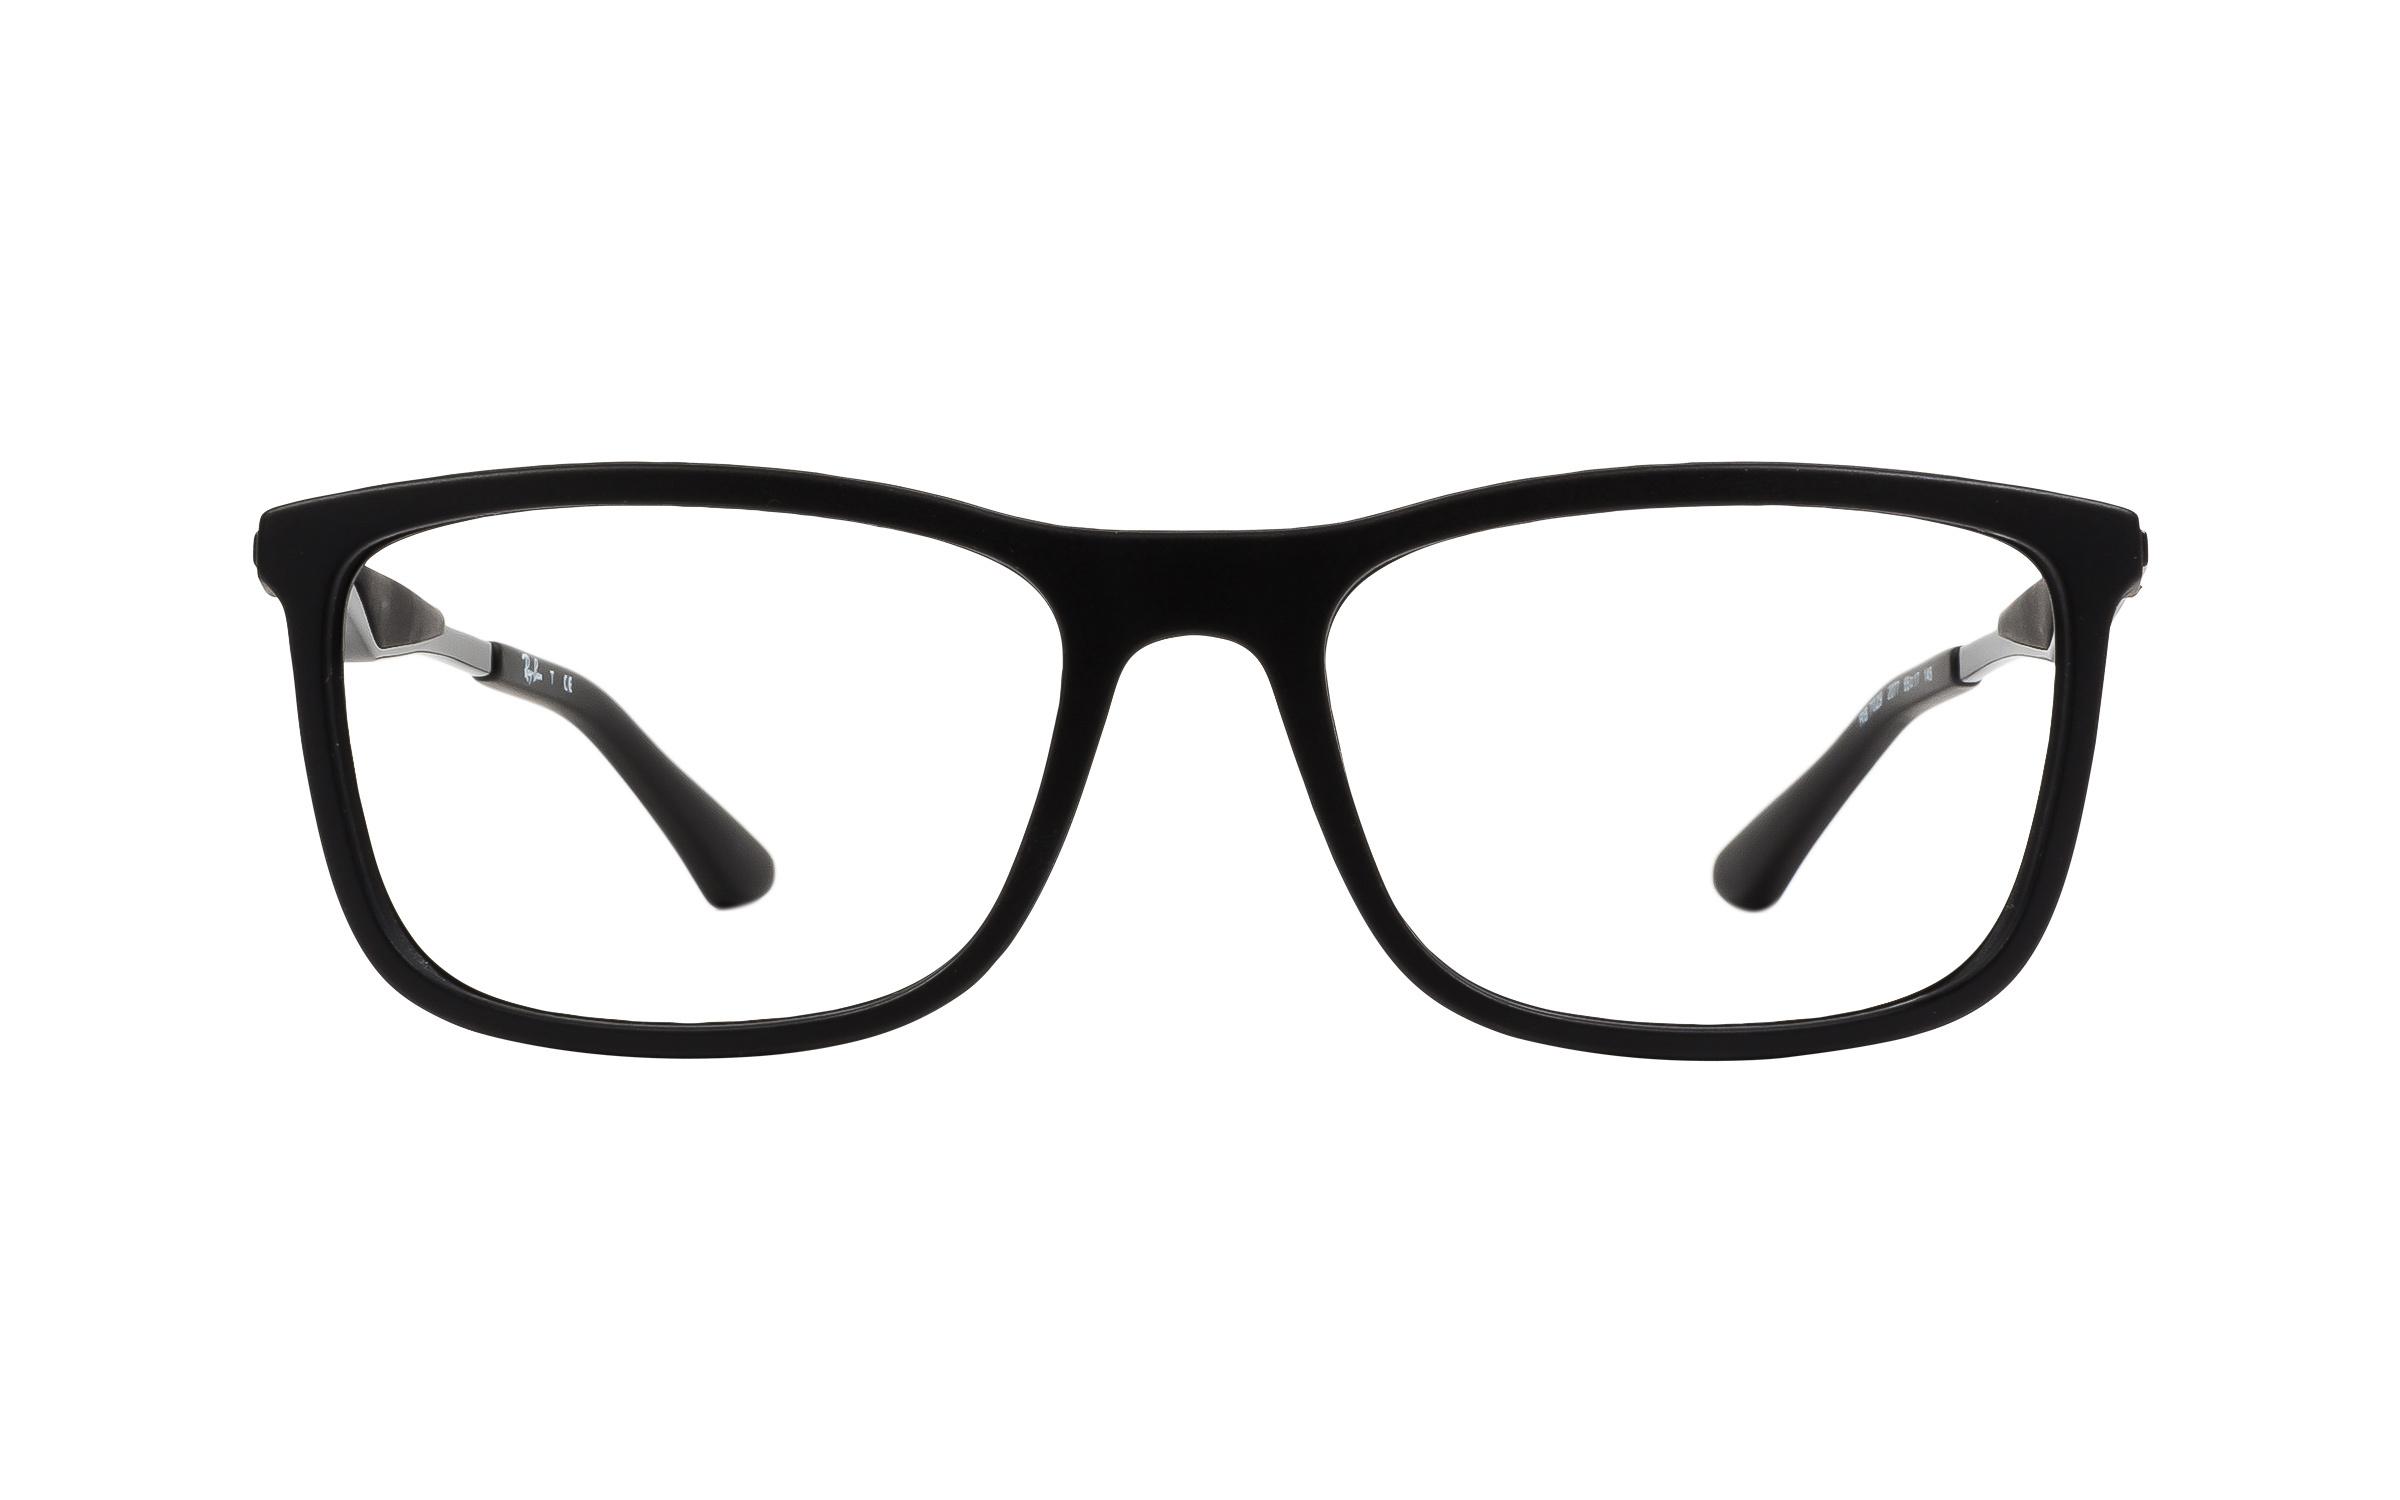 http://www.coastal.com/ - Luxottica Ray-Ban Wayfarer RB7029 2077 Eyeglasses and Frame in Matte Black – Online Coastal